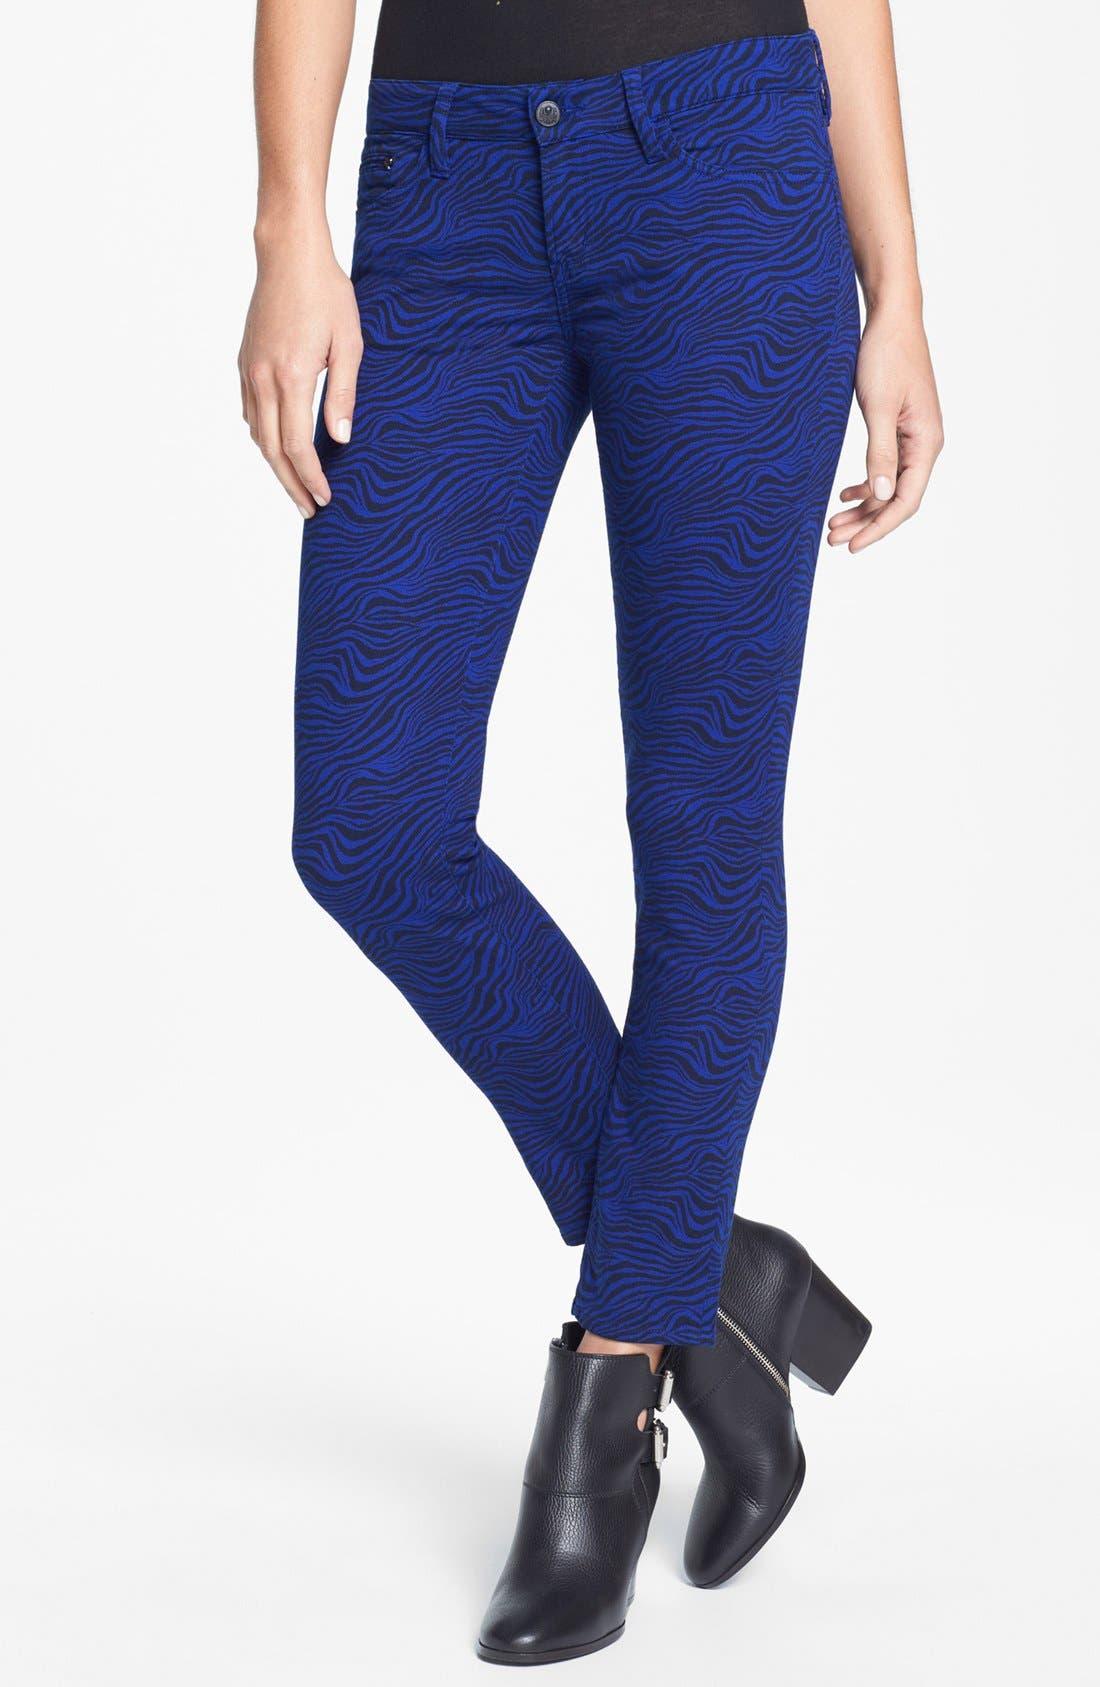 Alternate Image 1 Selected - The Kooples Zebra Print Stretch Skinny Jeans